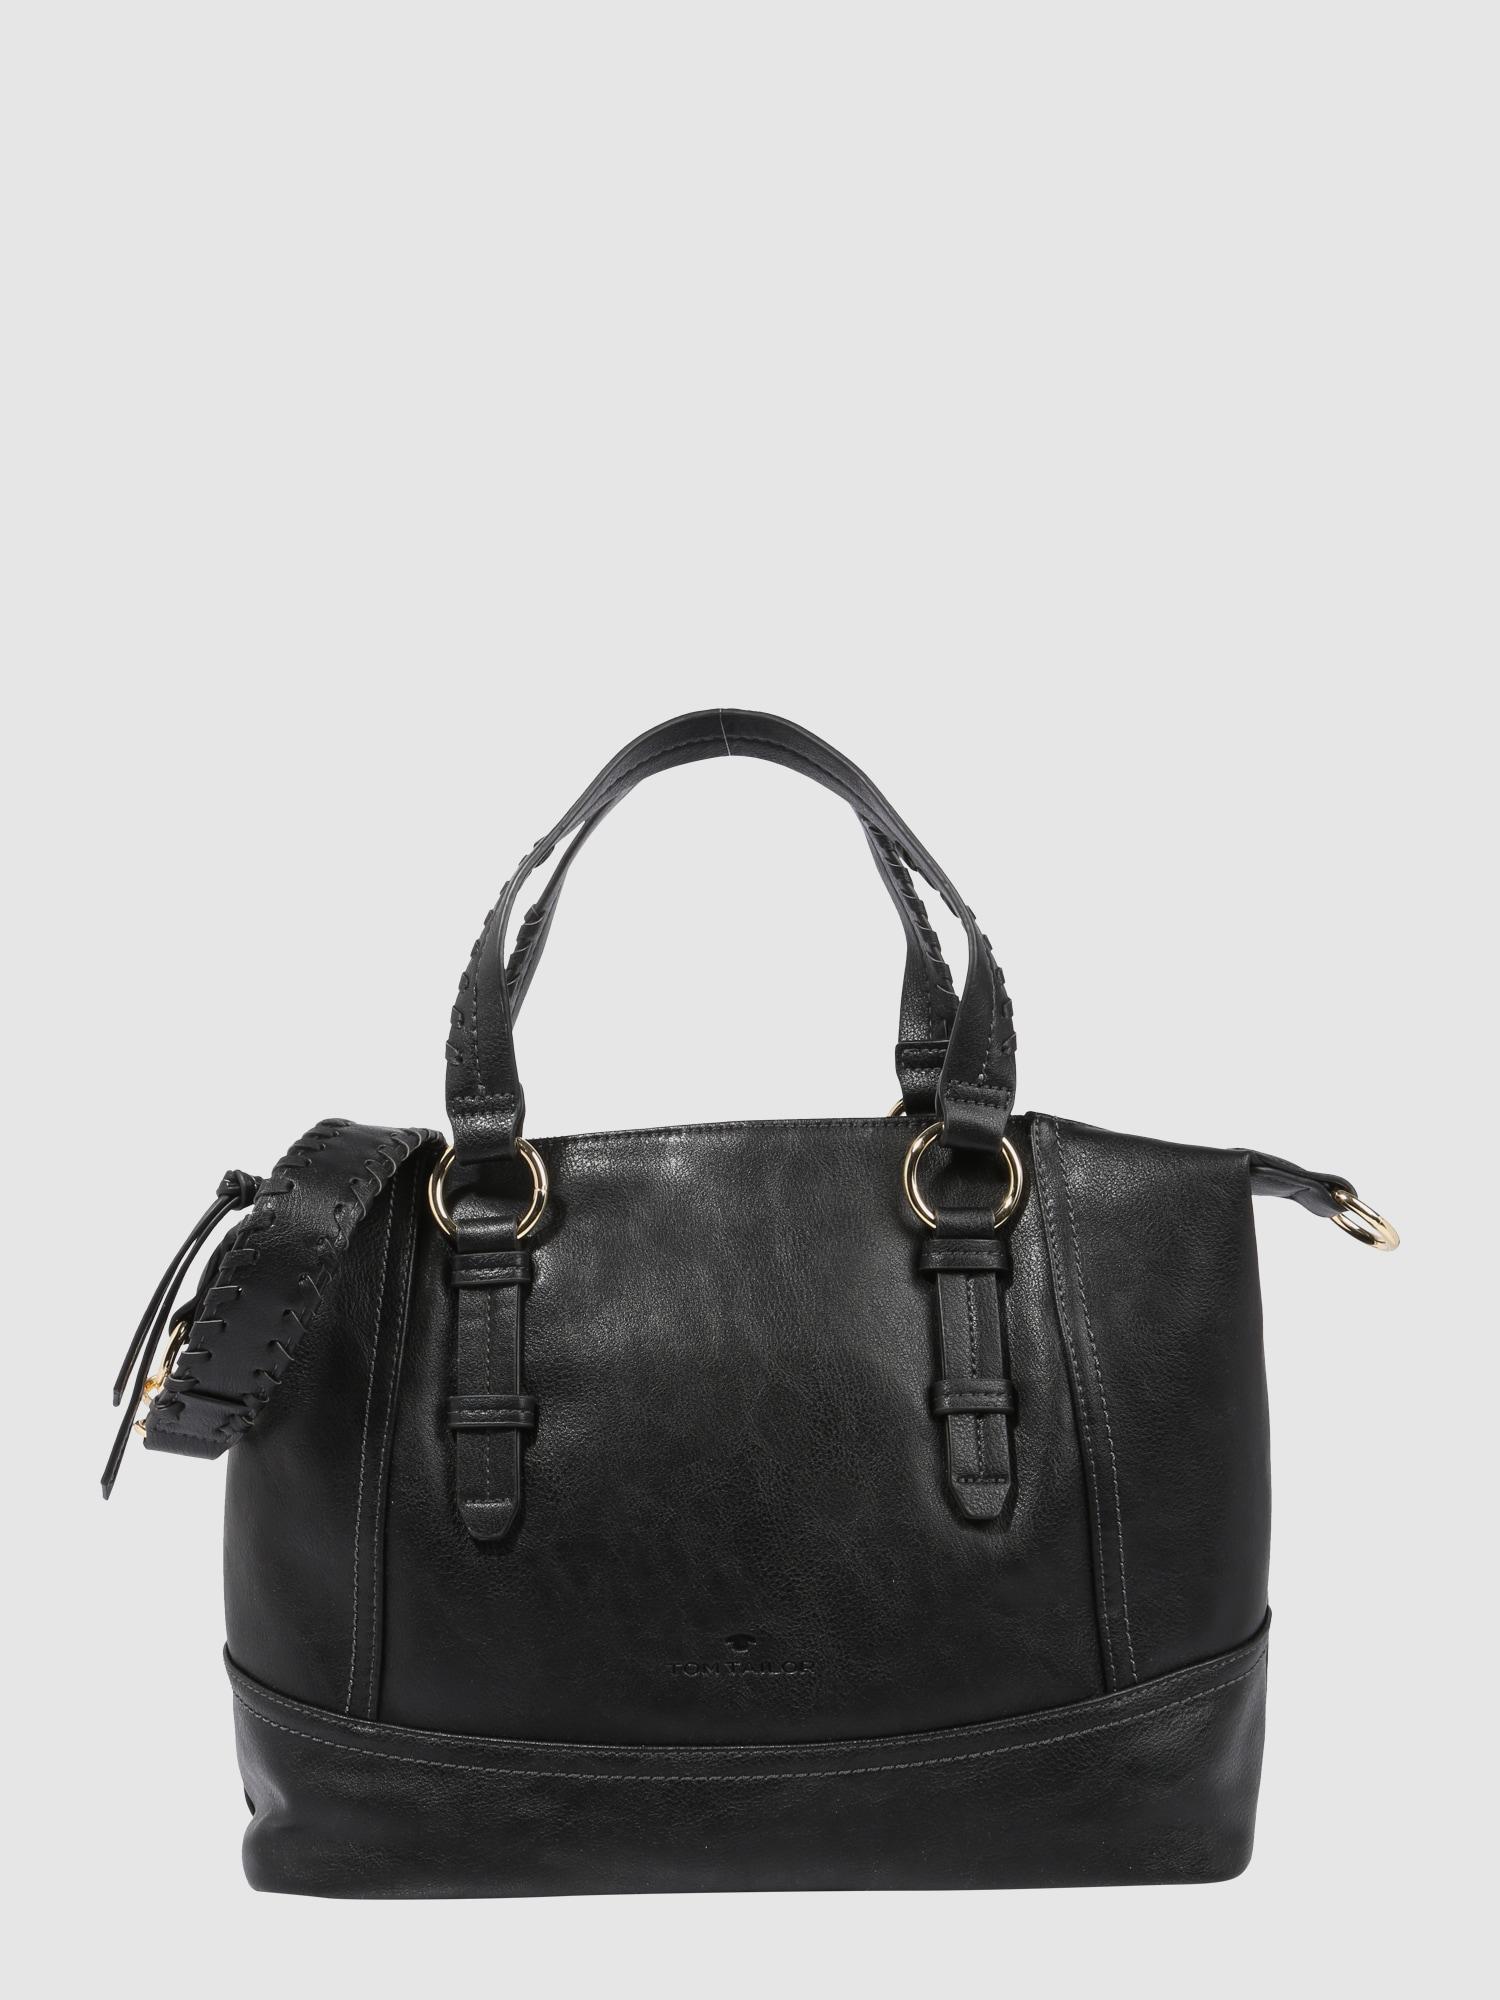 tom tailor handtasche 39 asta 39 in schwarz about you. Black Bedroom Furniture Sets. Home Design Ideas